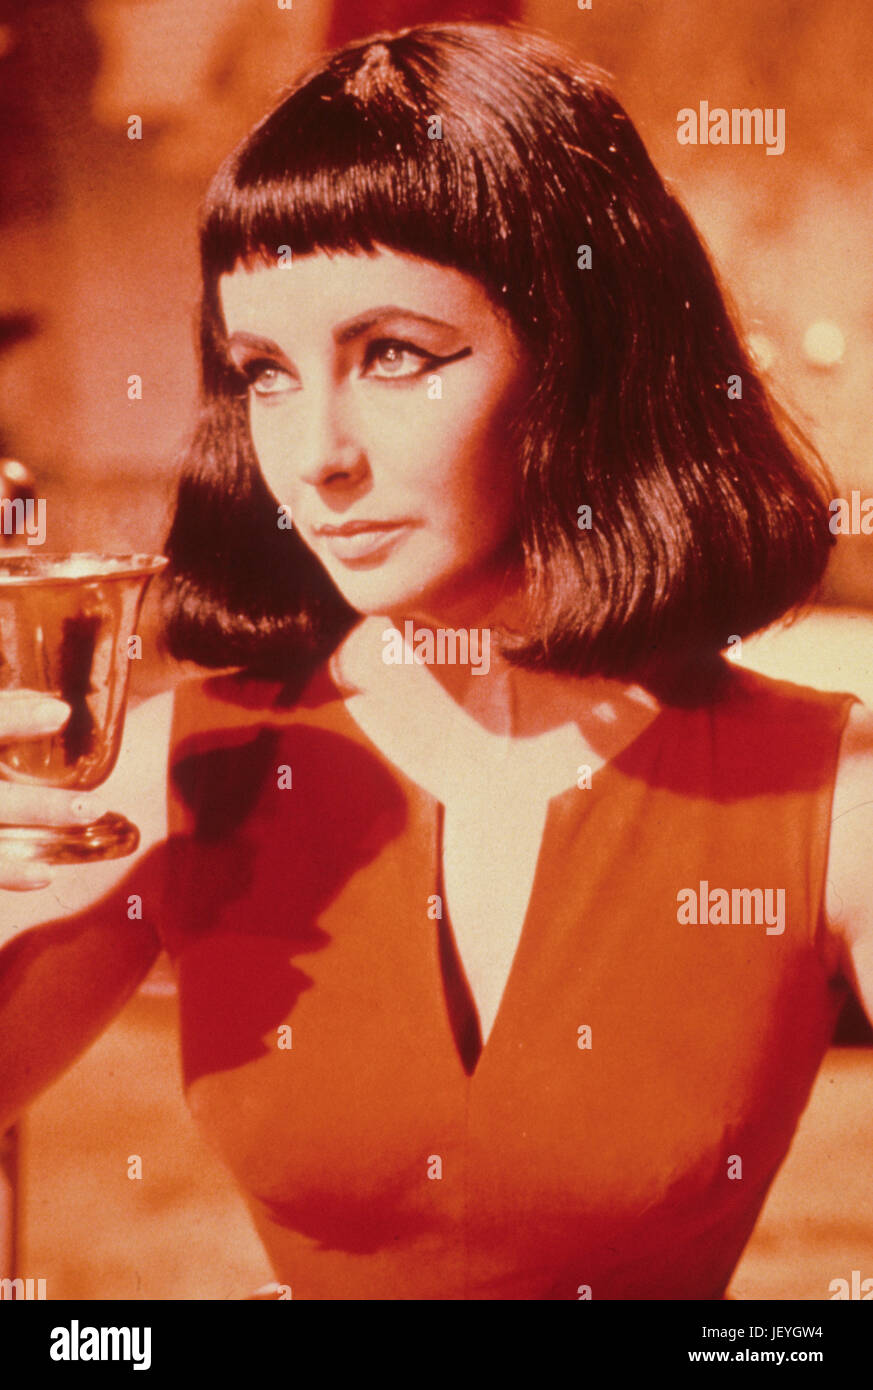 elizabeth taylor, cleopatra, 1963 - Stock Image